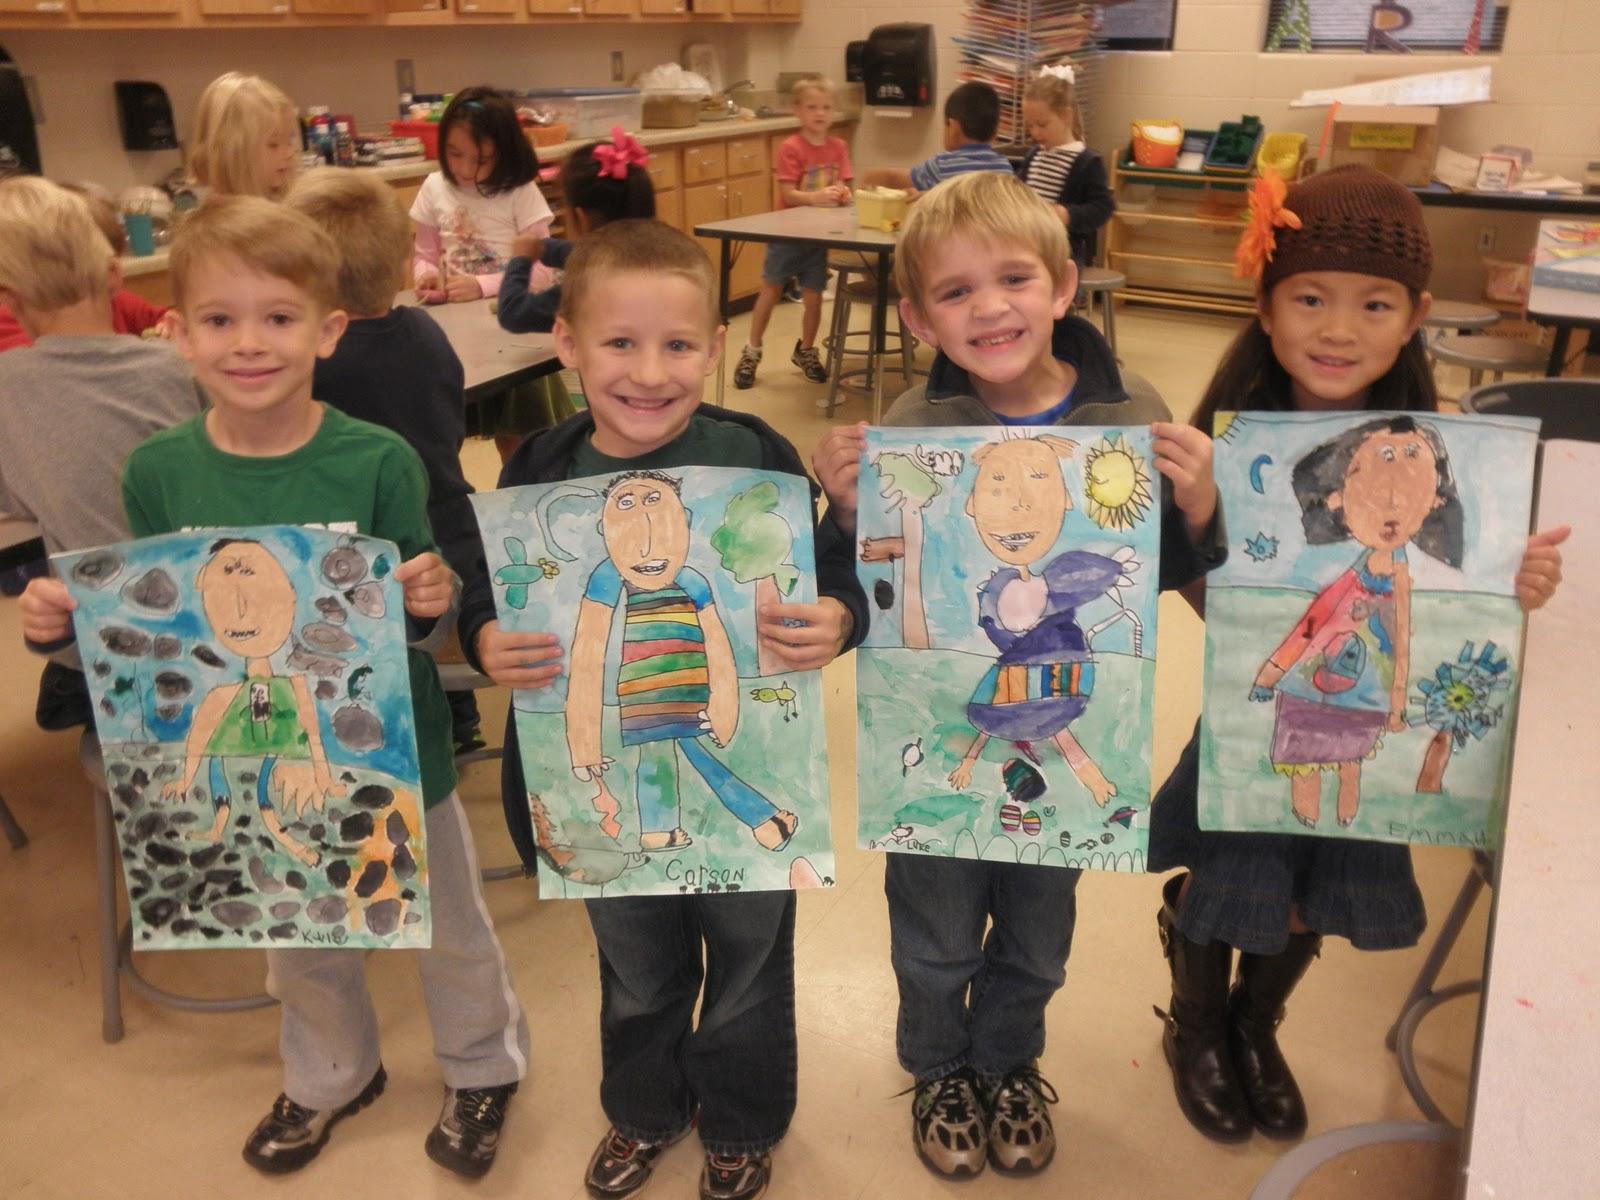 Related Keywords Amp Suggestions For Kindergarten Self Portraits